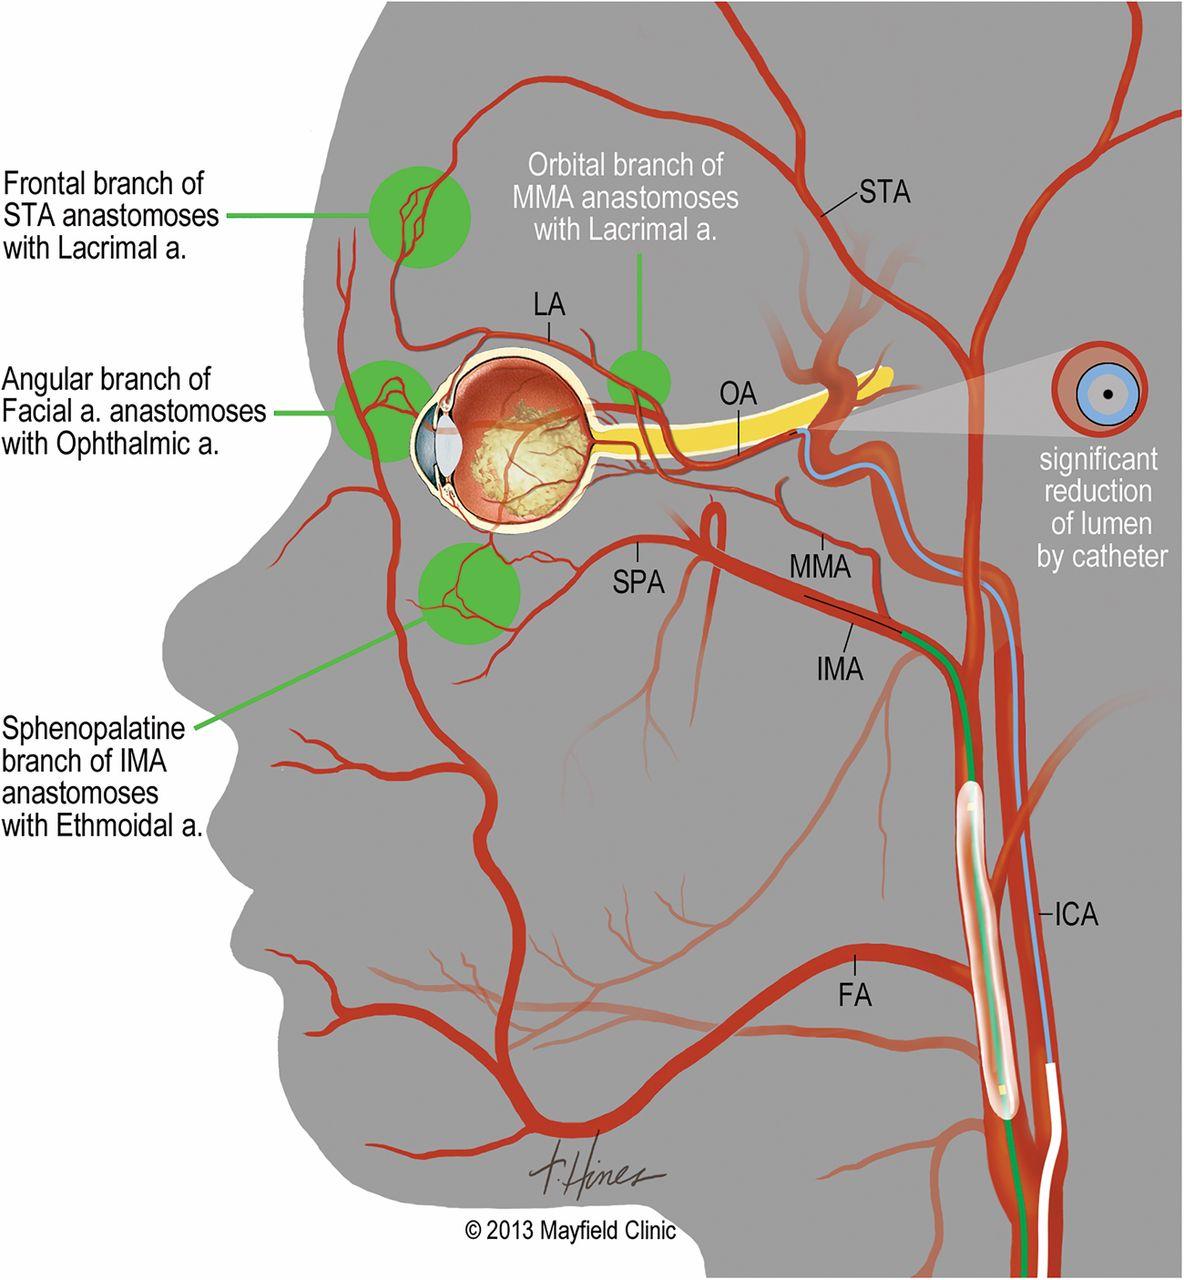 carotid artery diagram fender telecaster wiring seymour duncan adjunctive techniques for optimization of ocular hemodynamics in children undergoing ophthalmic ...